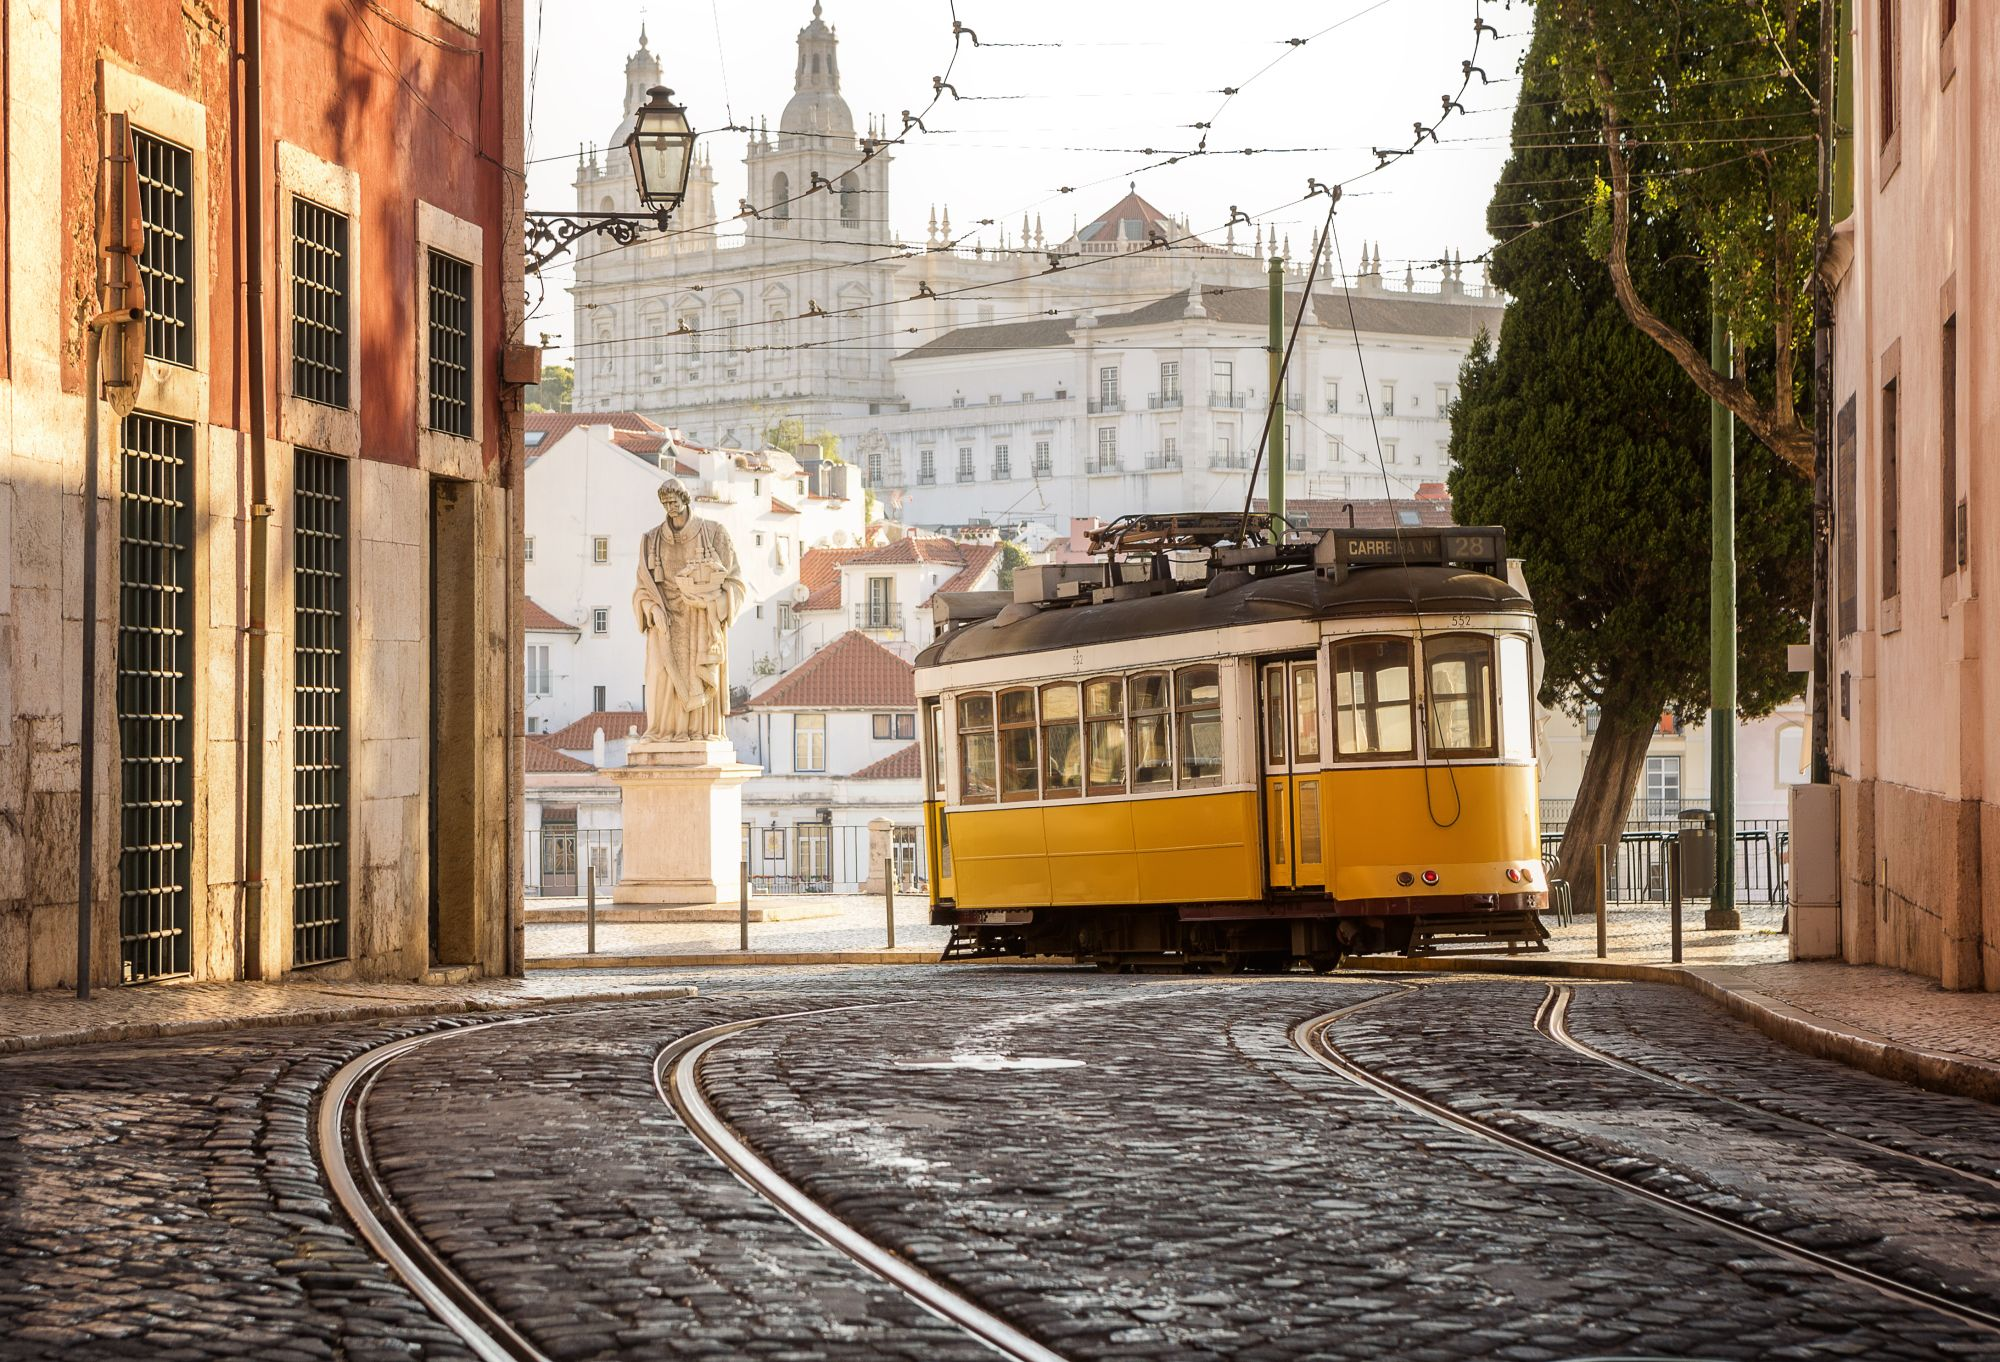 Spain, Portugal & Morocco Explorer Tours 2019 - 2020 -  Yellow tram